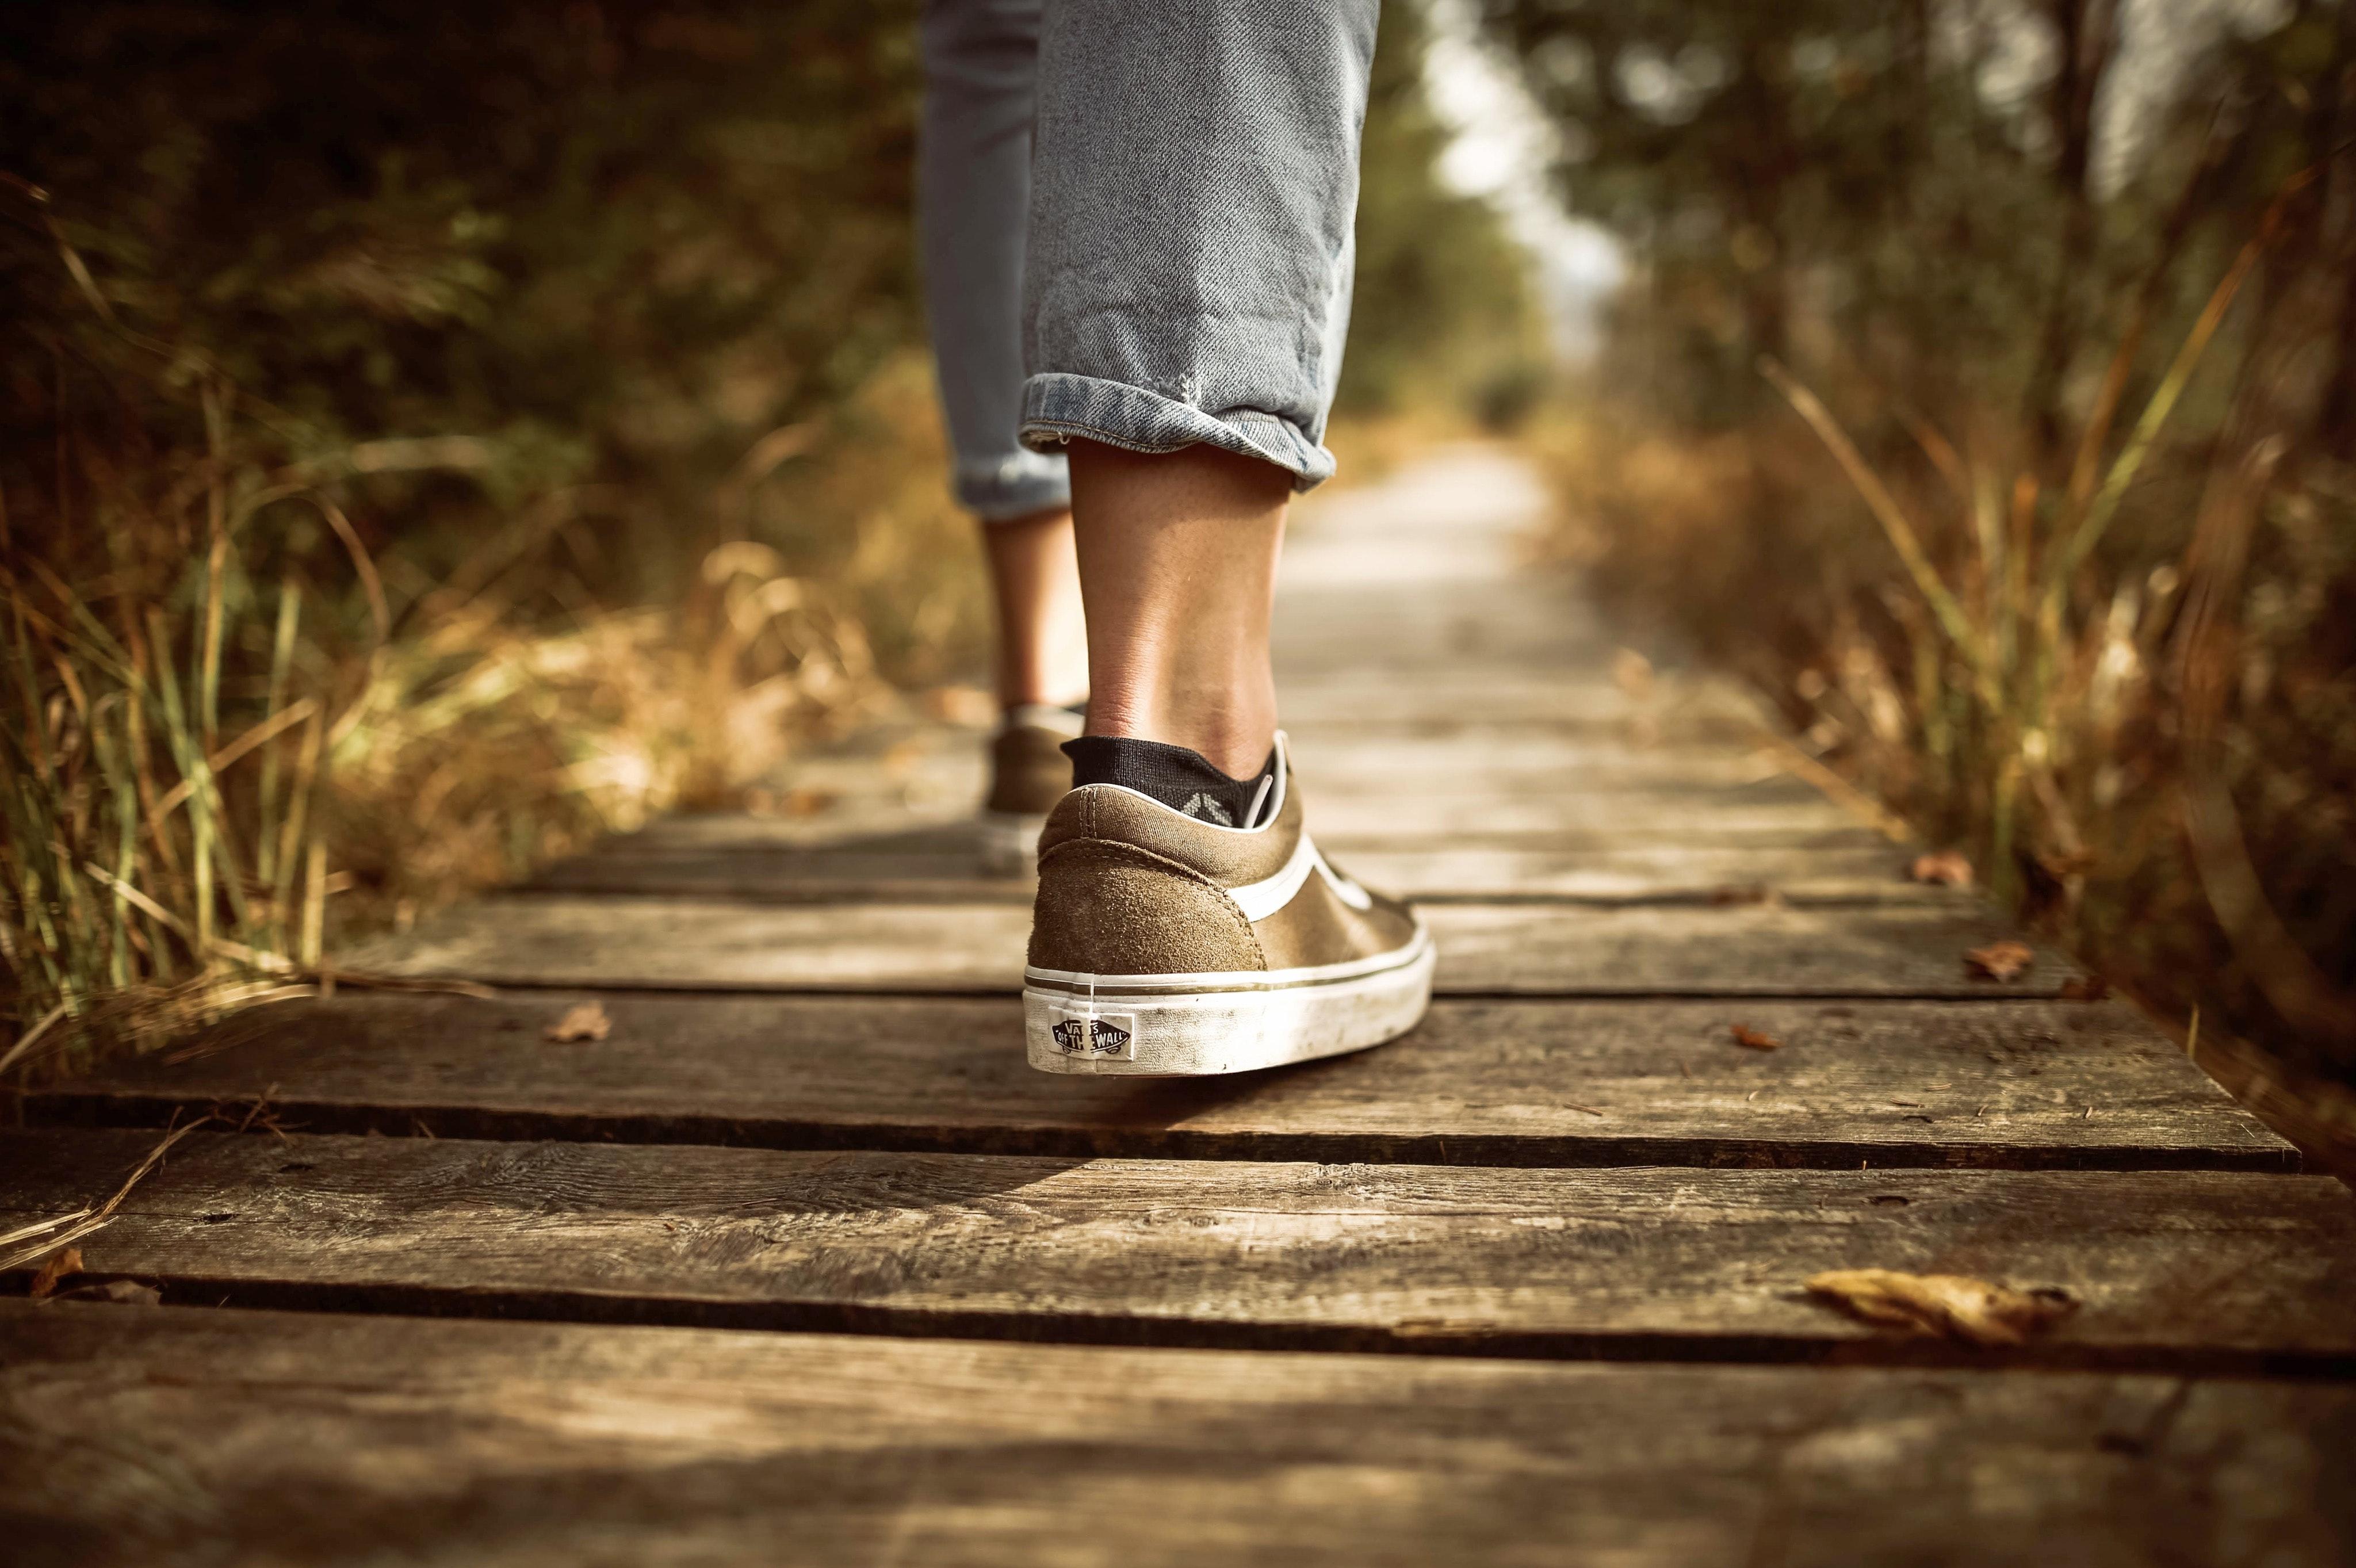 Adolescent Walking on Road